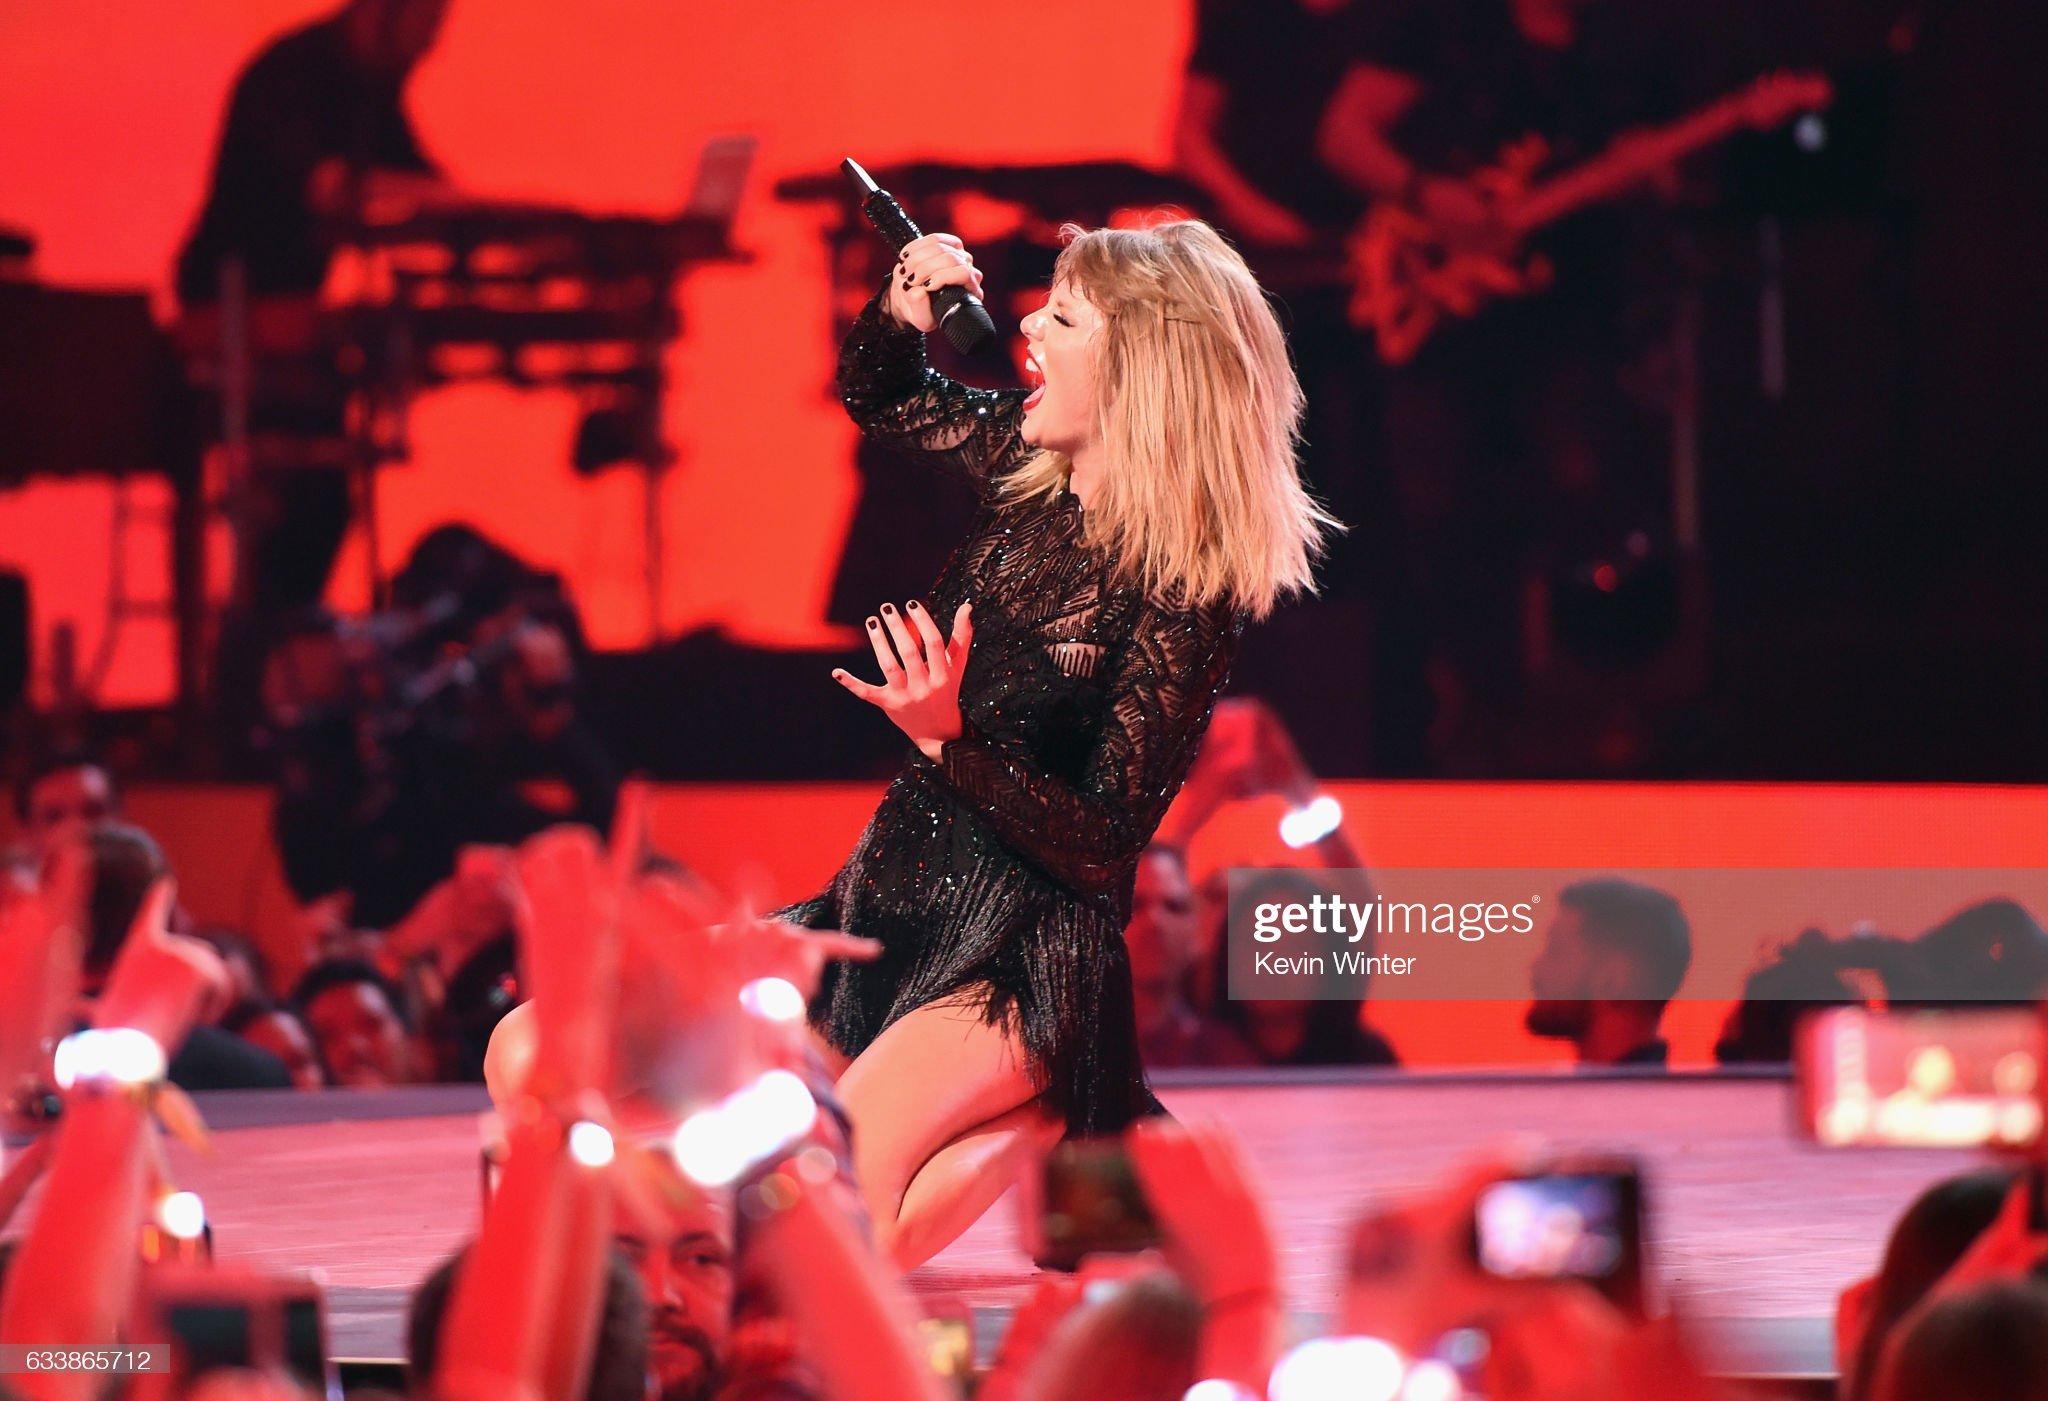 2017 DIRECTV NOW Super Saturday Night Concert In Houston - Taylor Swift Performance : News Photo